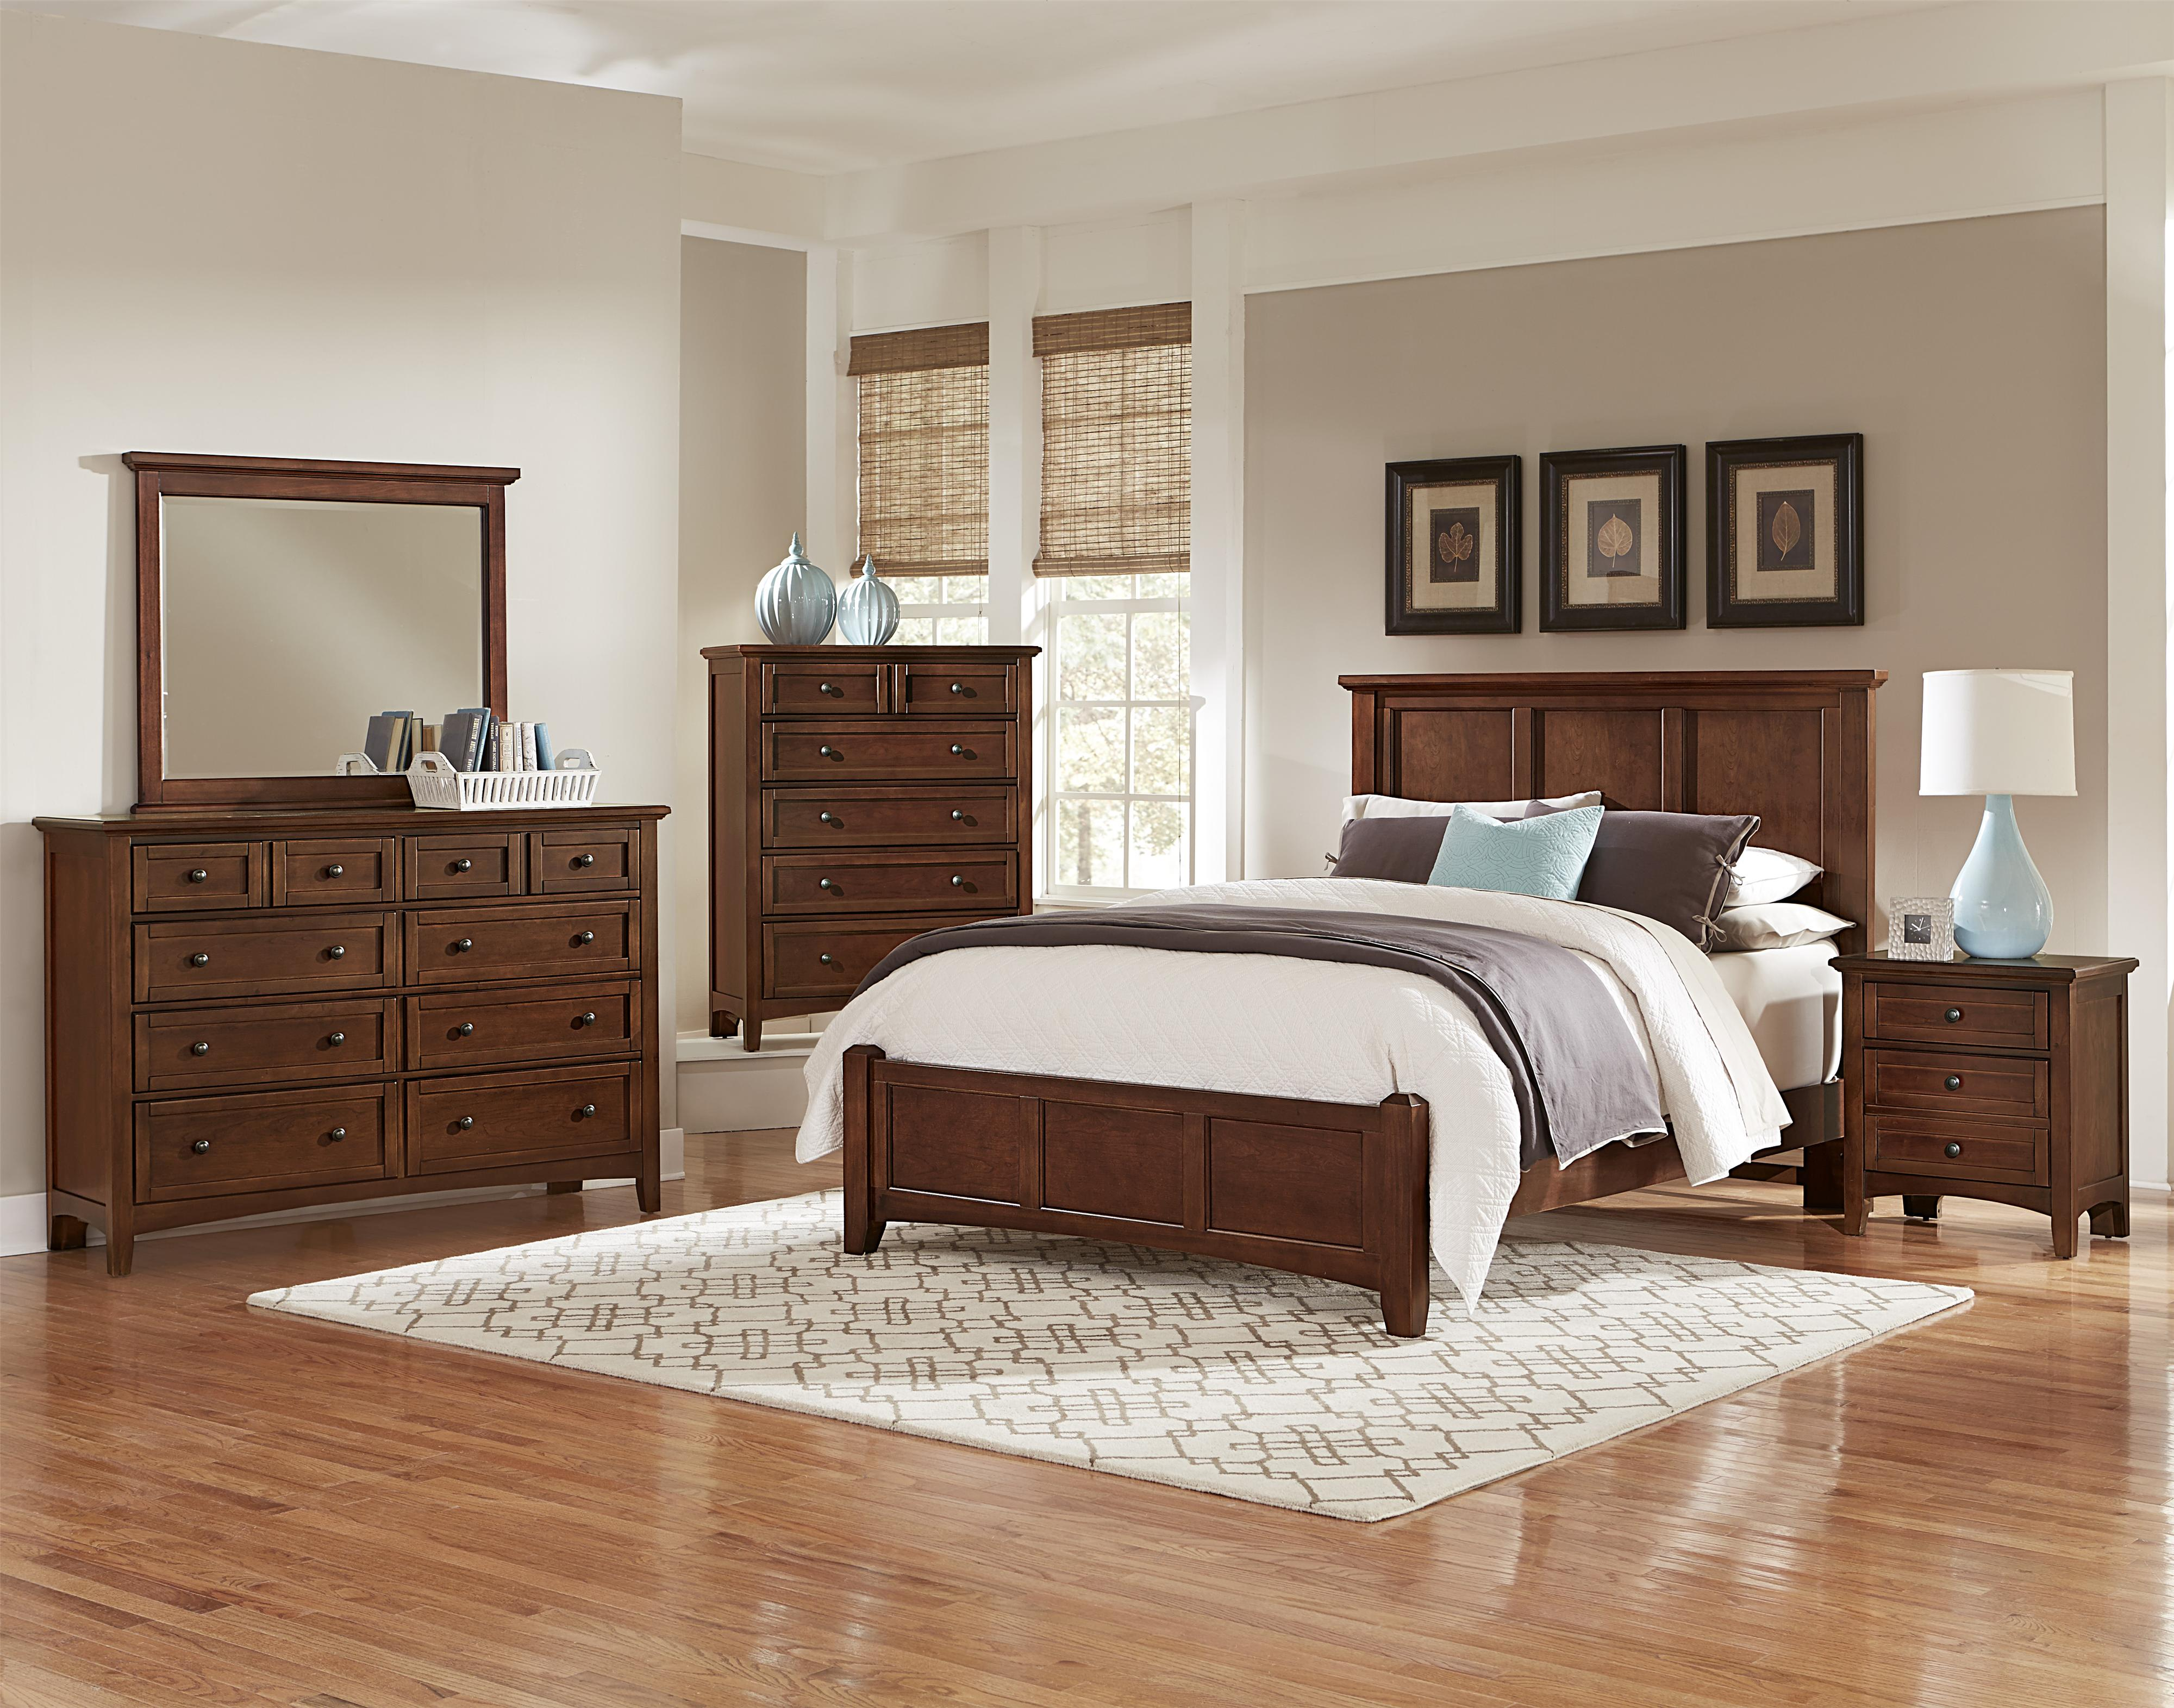 Vaughan bassett bonanza california king mansion bed with for Bassett bedroom furniture